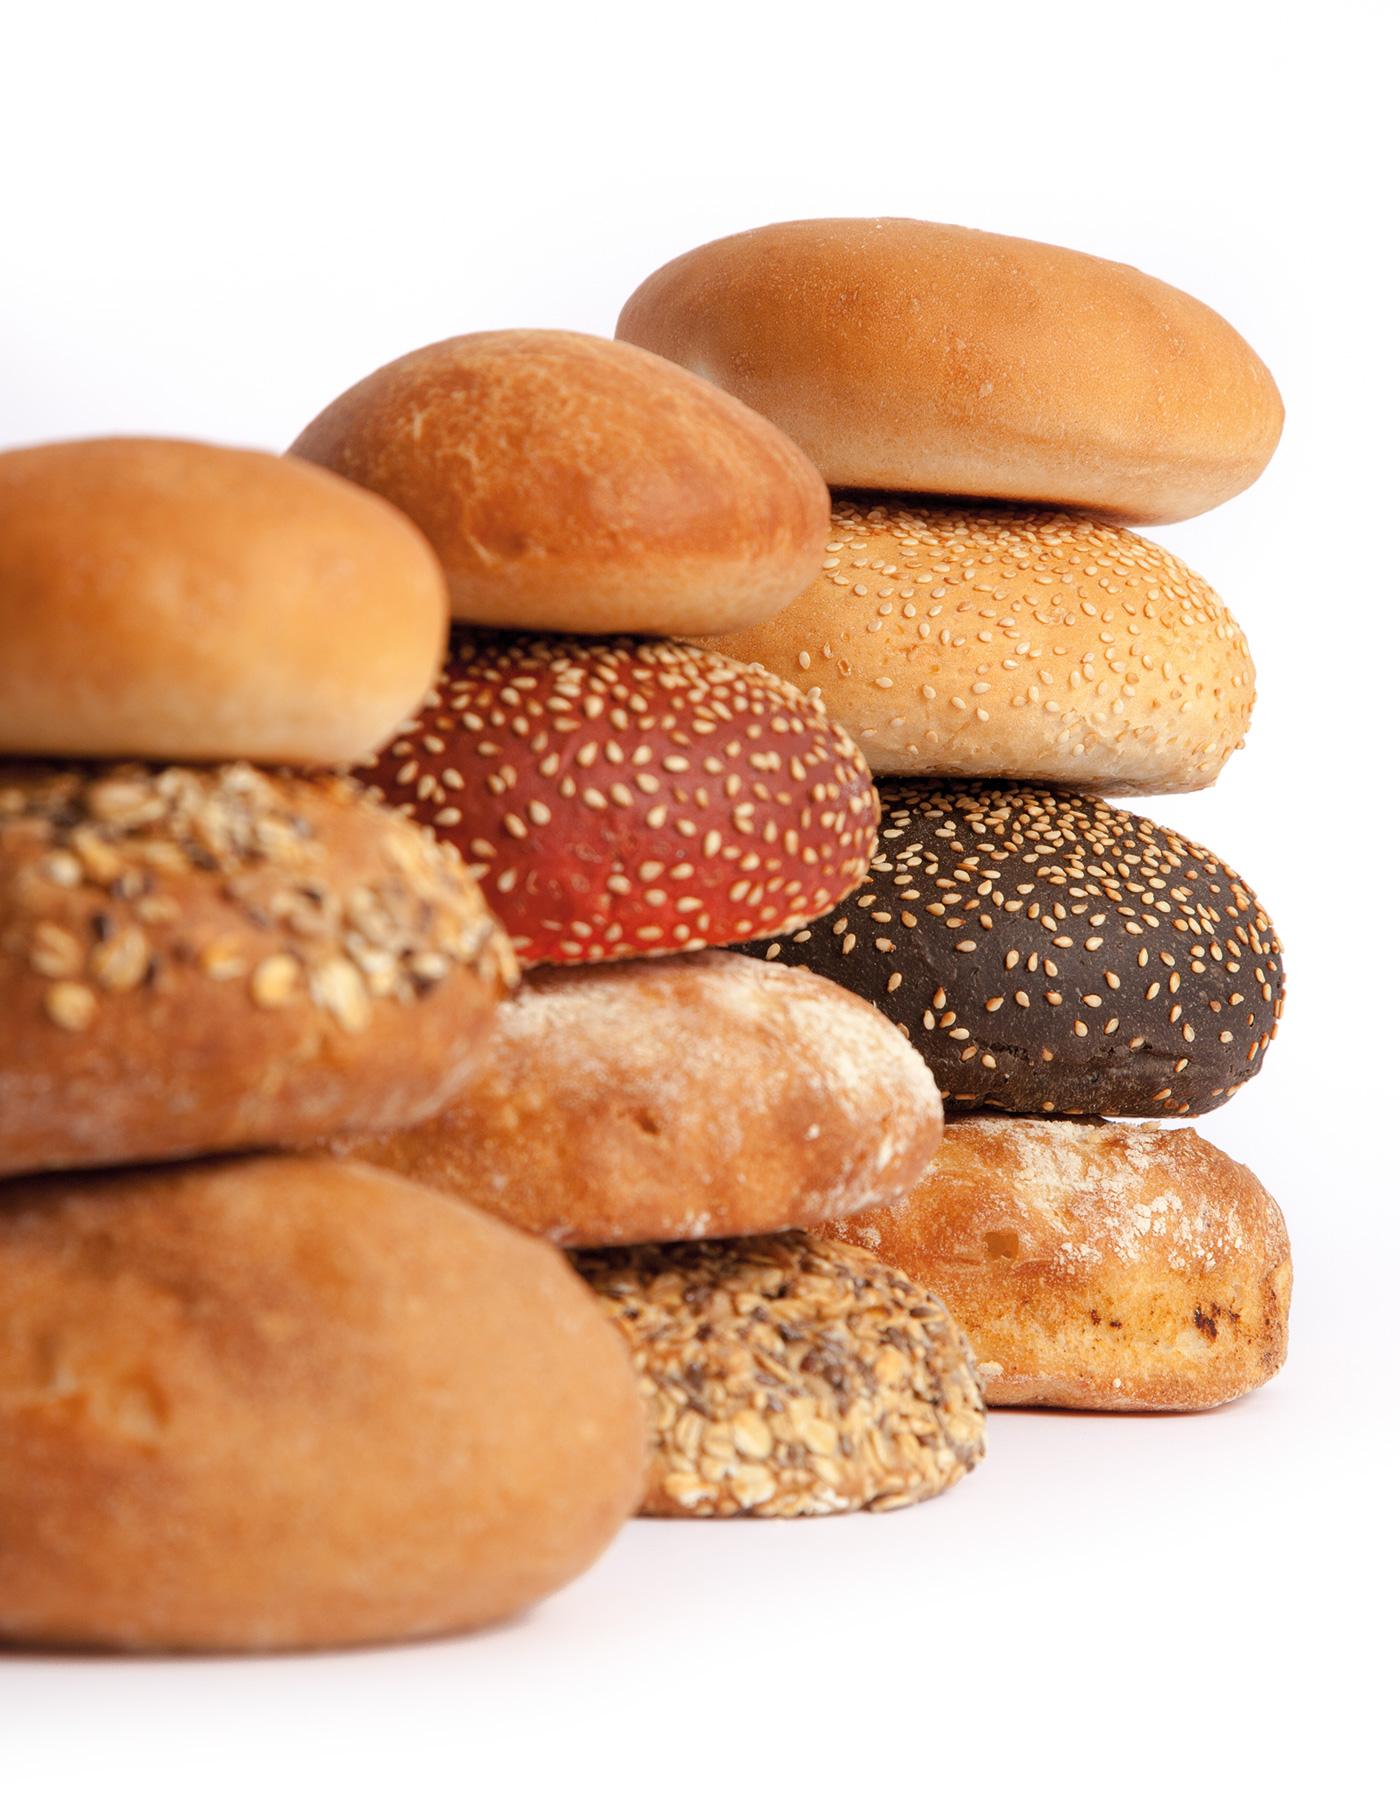 Fotografies de pans hamburguer de Bonblat Osona